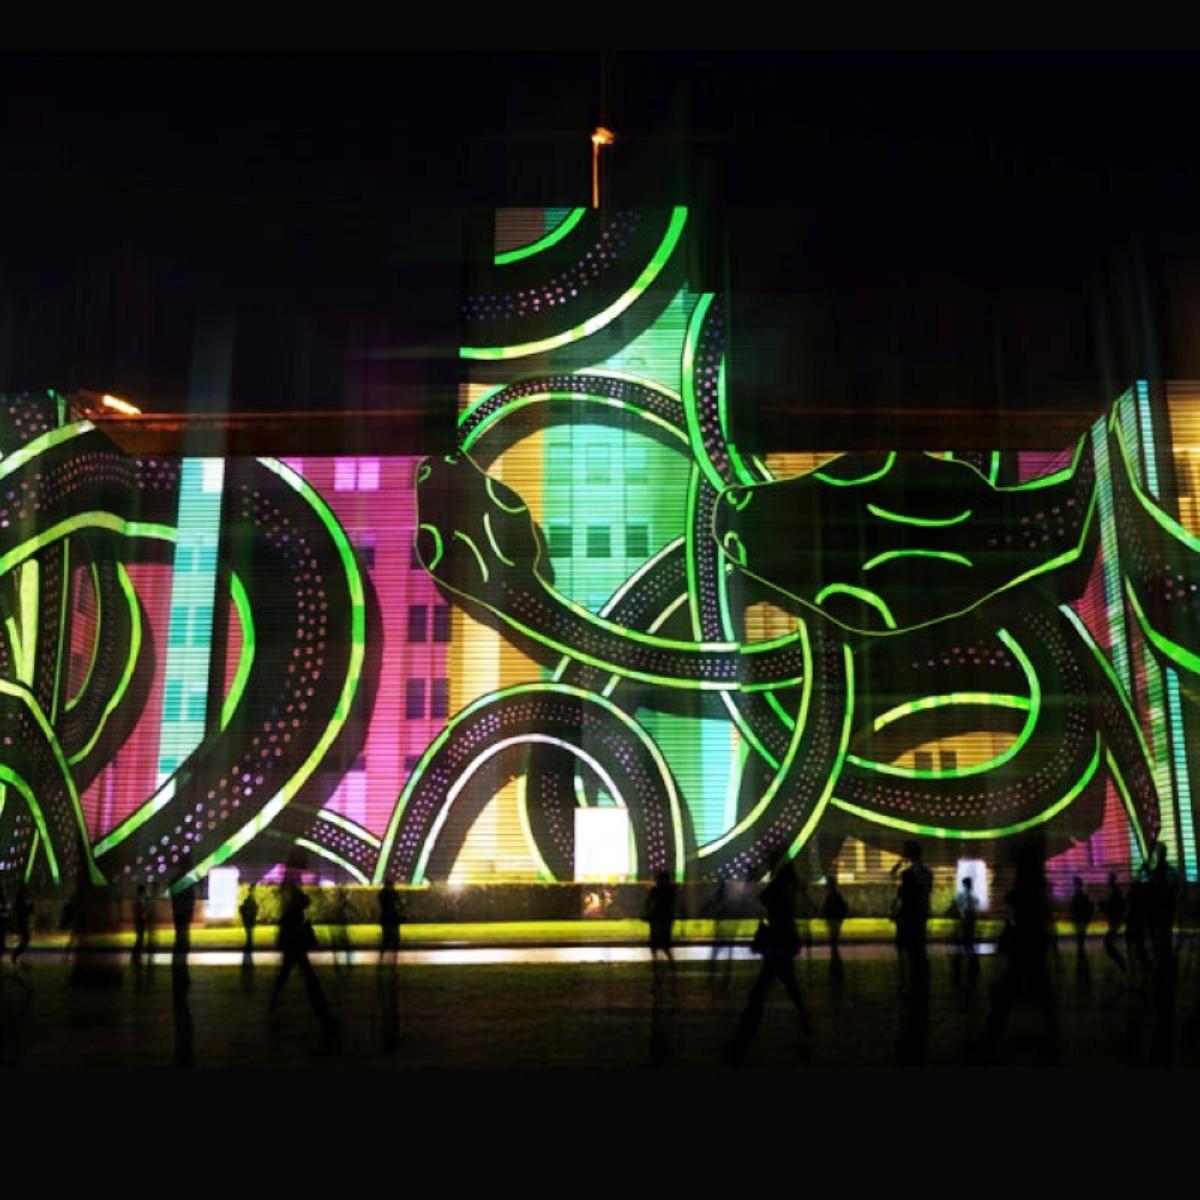 mca vivid festival 2014 (2)